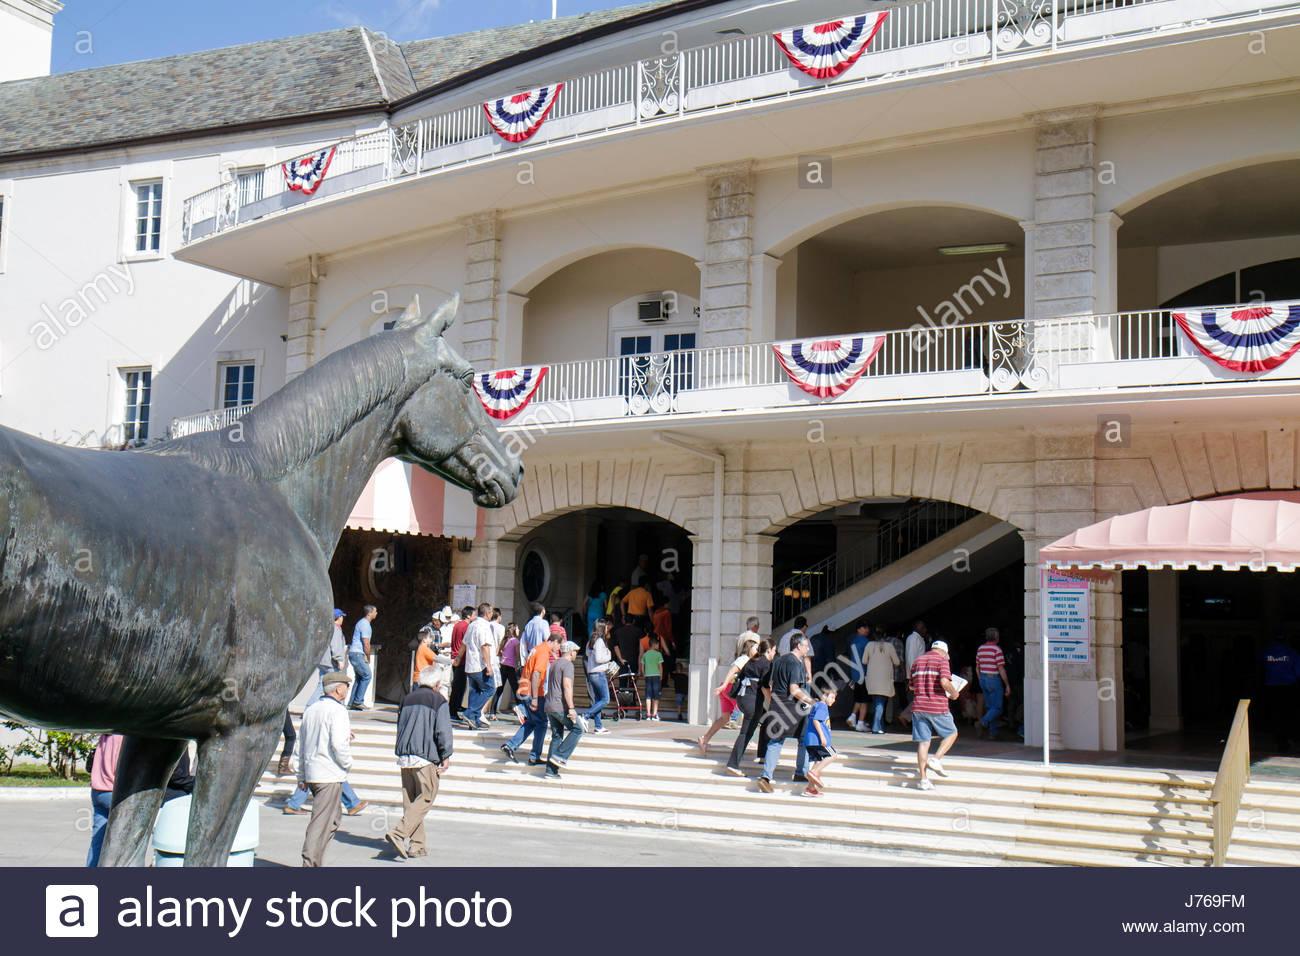 HialeahMiami Florida Hialeah Park quarter horse racing racetrack statue Citation Stock Photo